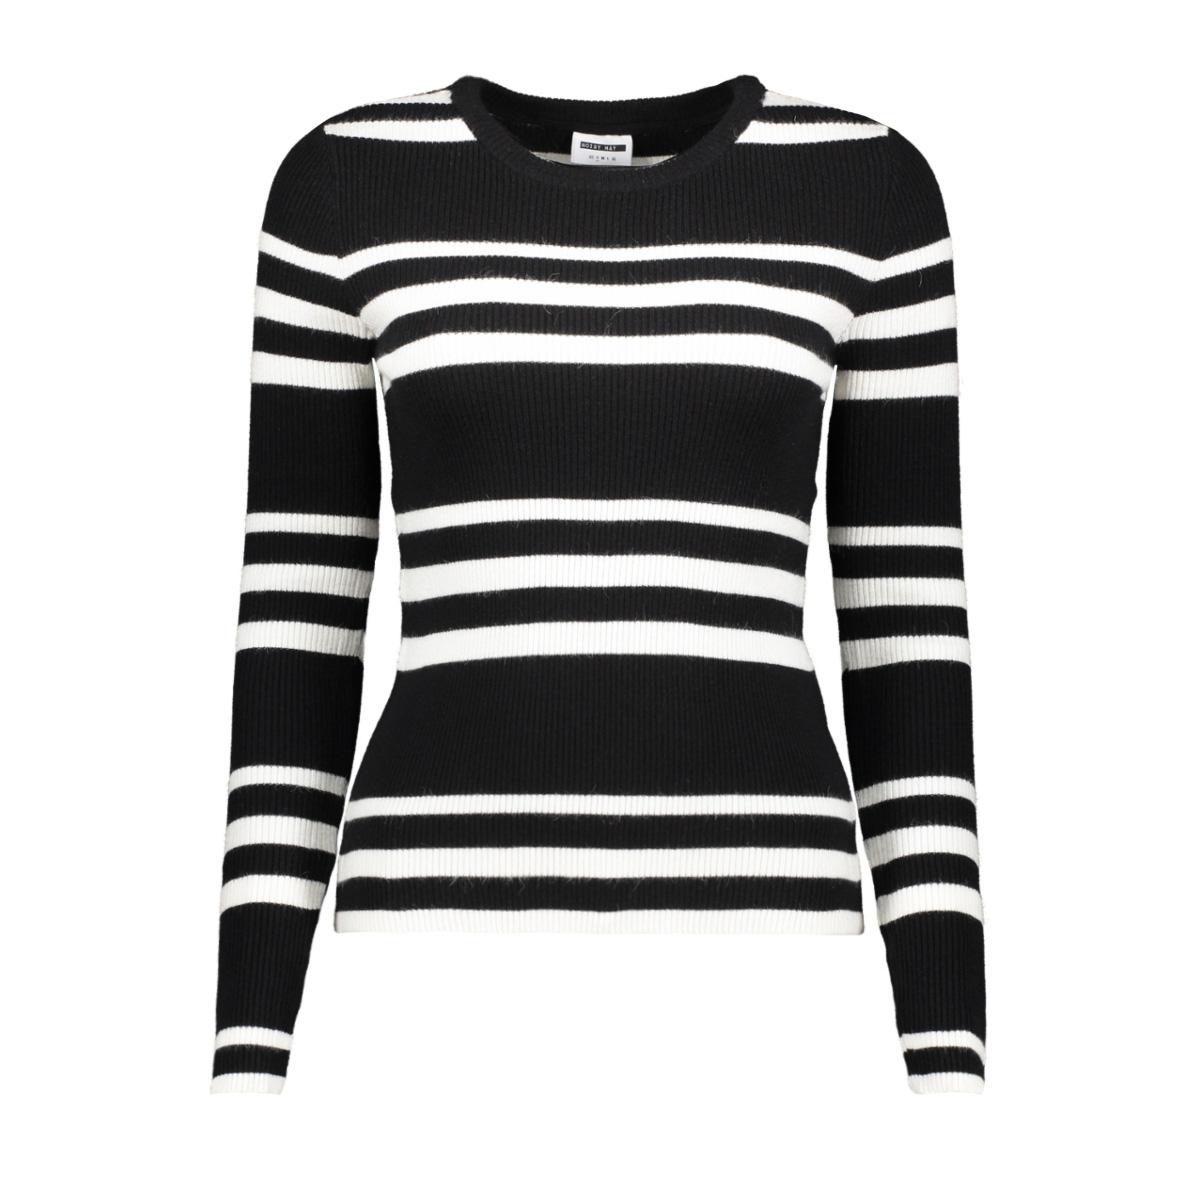 nmanthony l/s o-neck knit clr 27008300 noisy may trui black/sugar swizzle